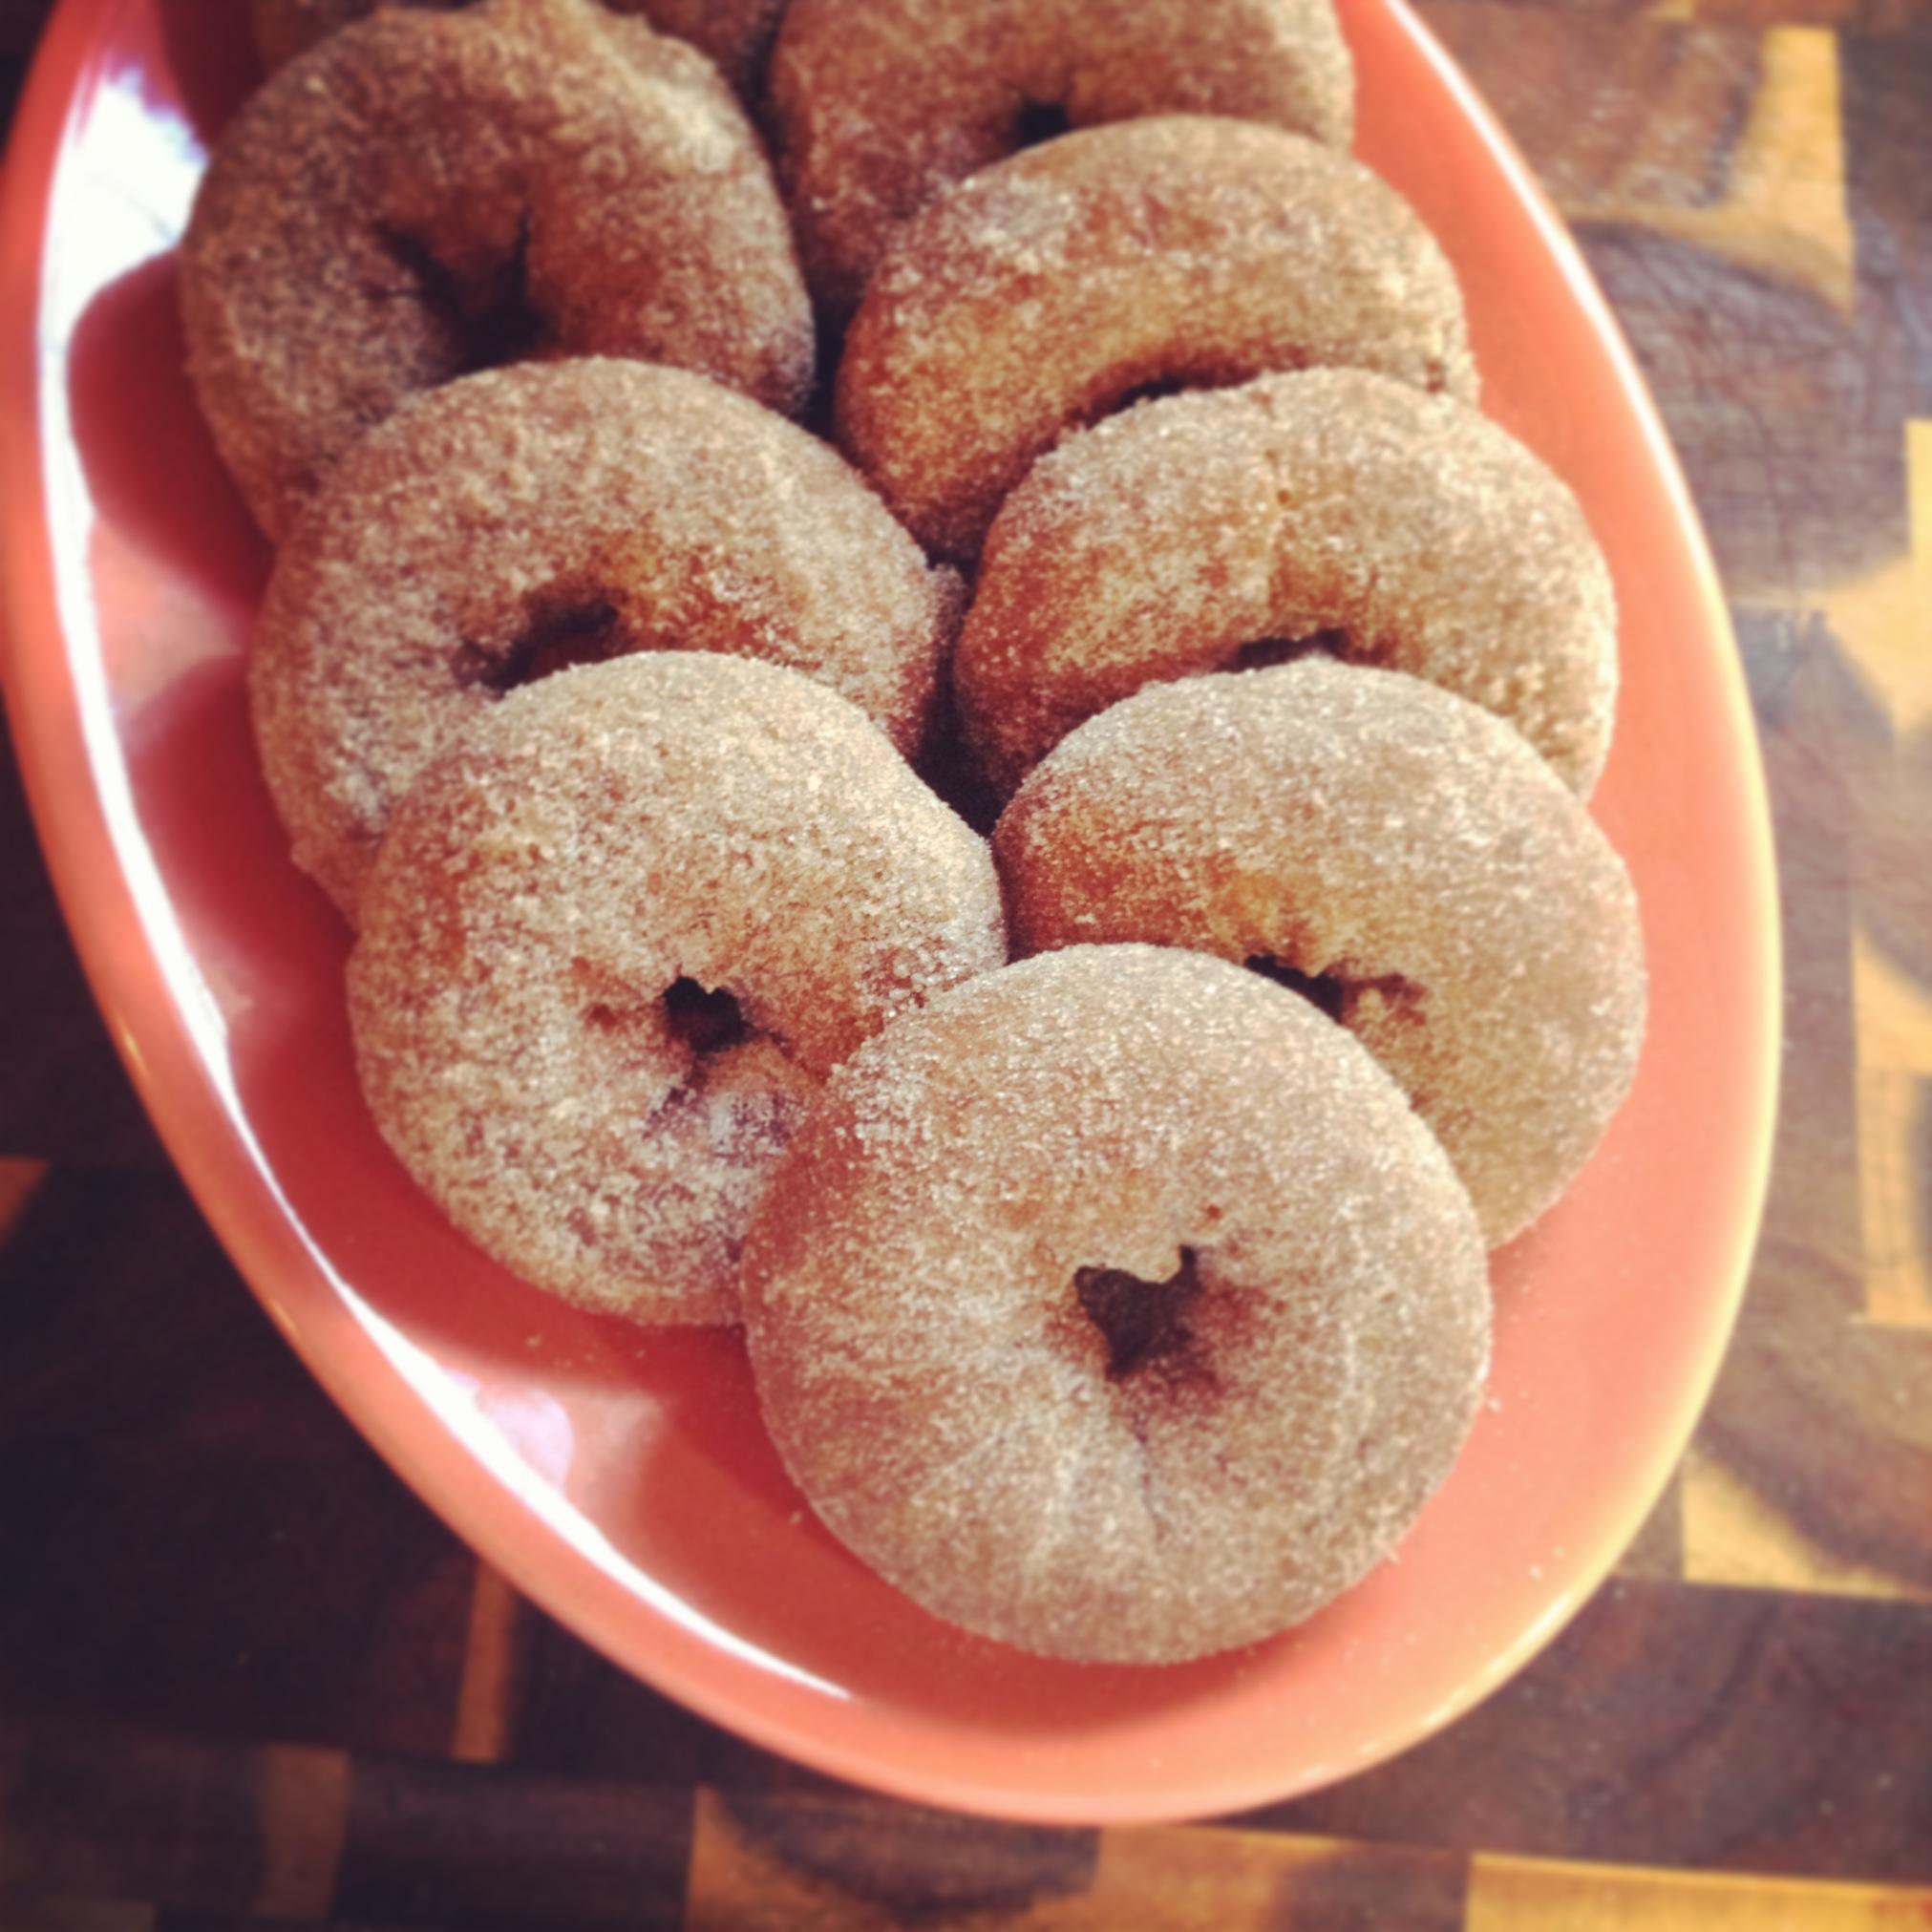 Fresh_Fancy_Doughnuts.JPG